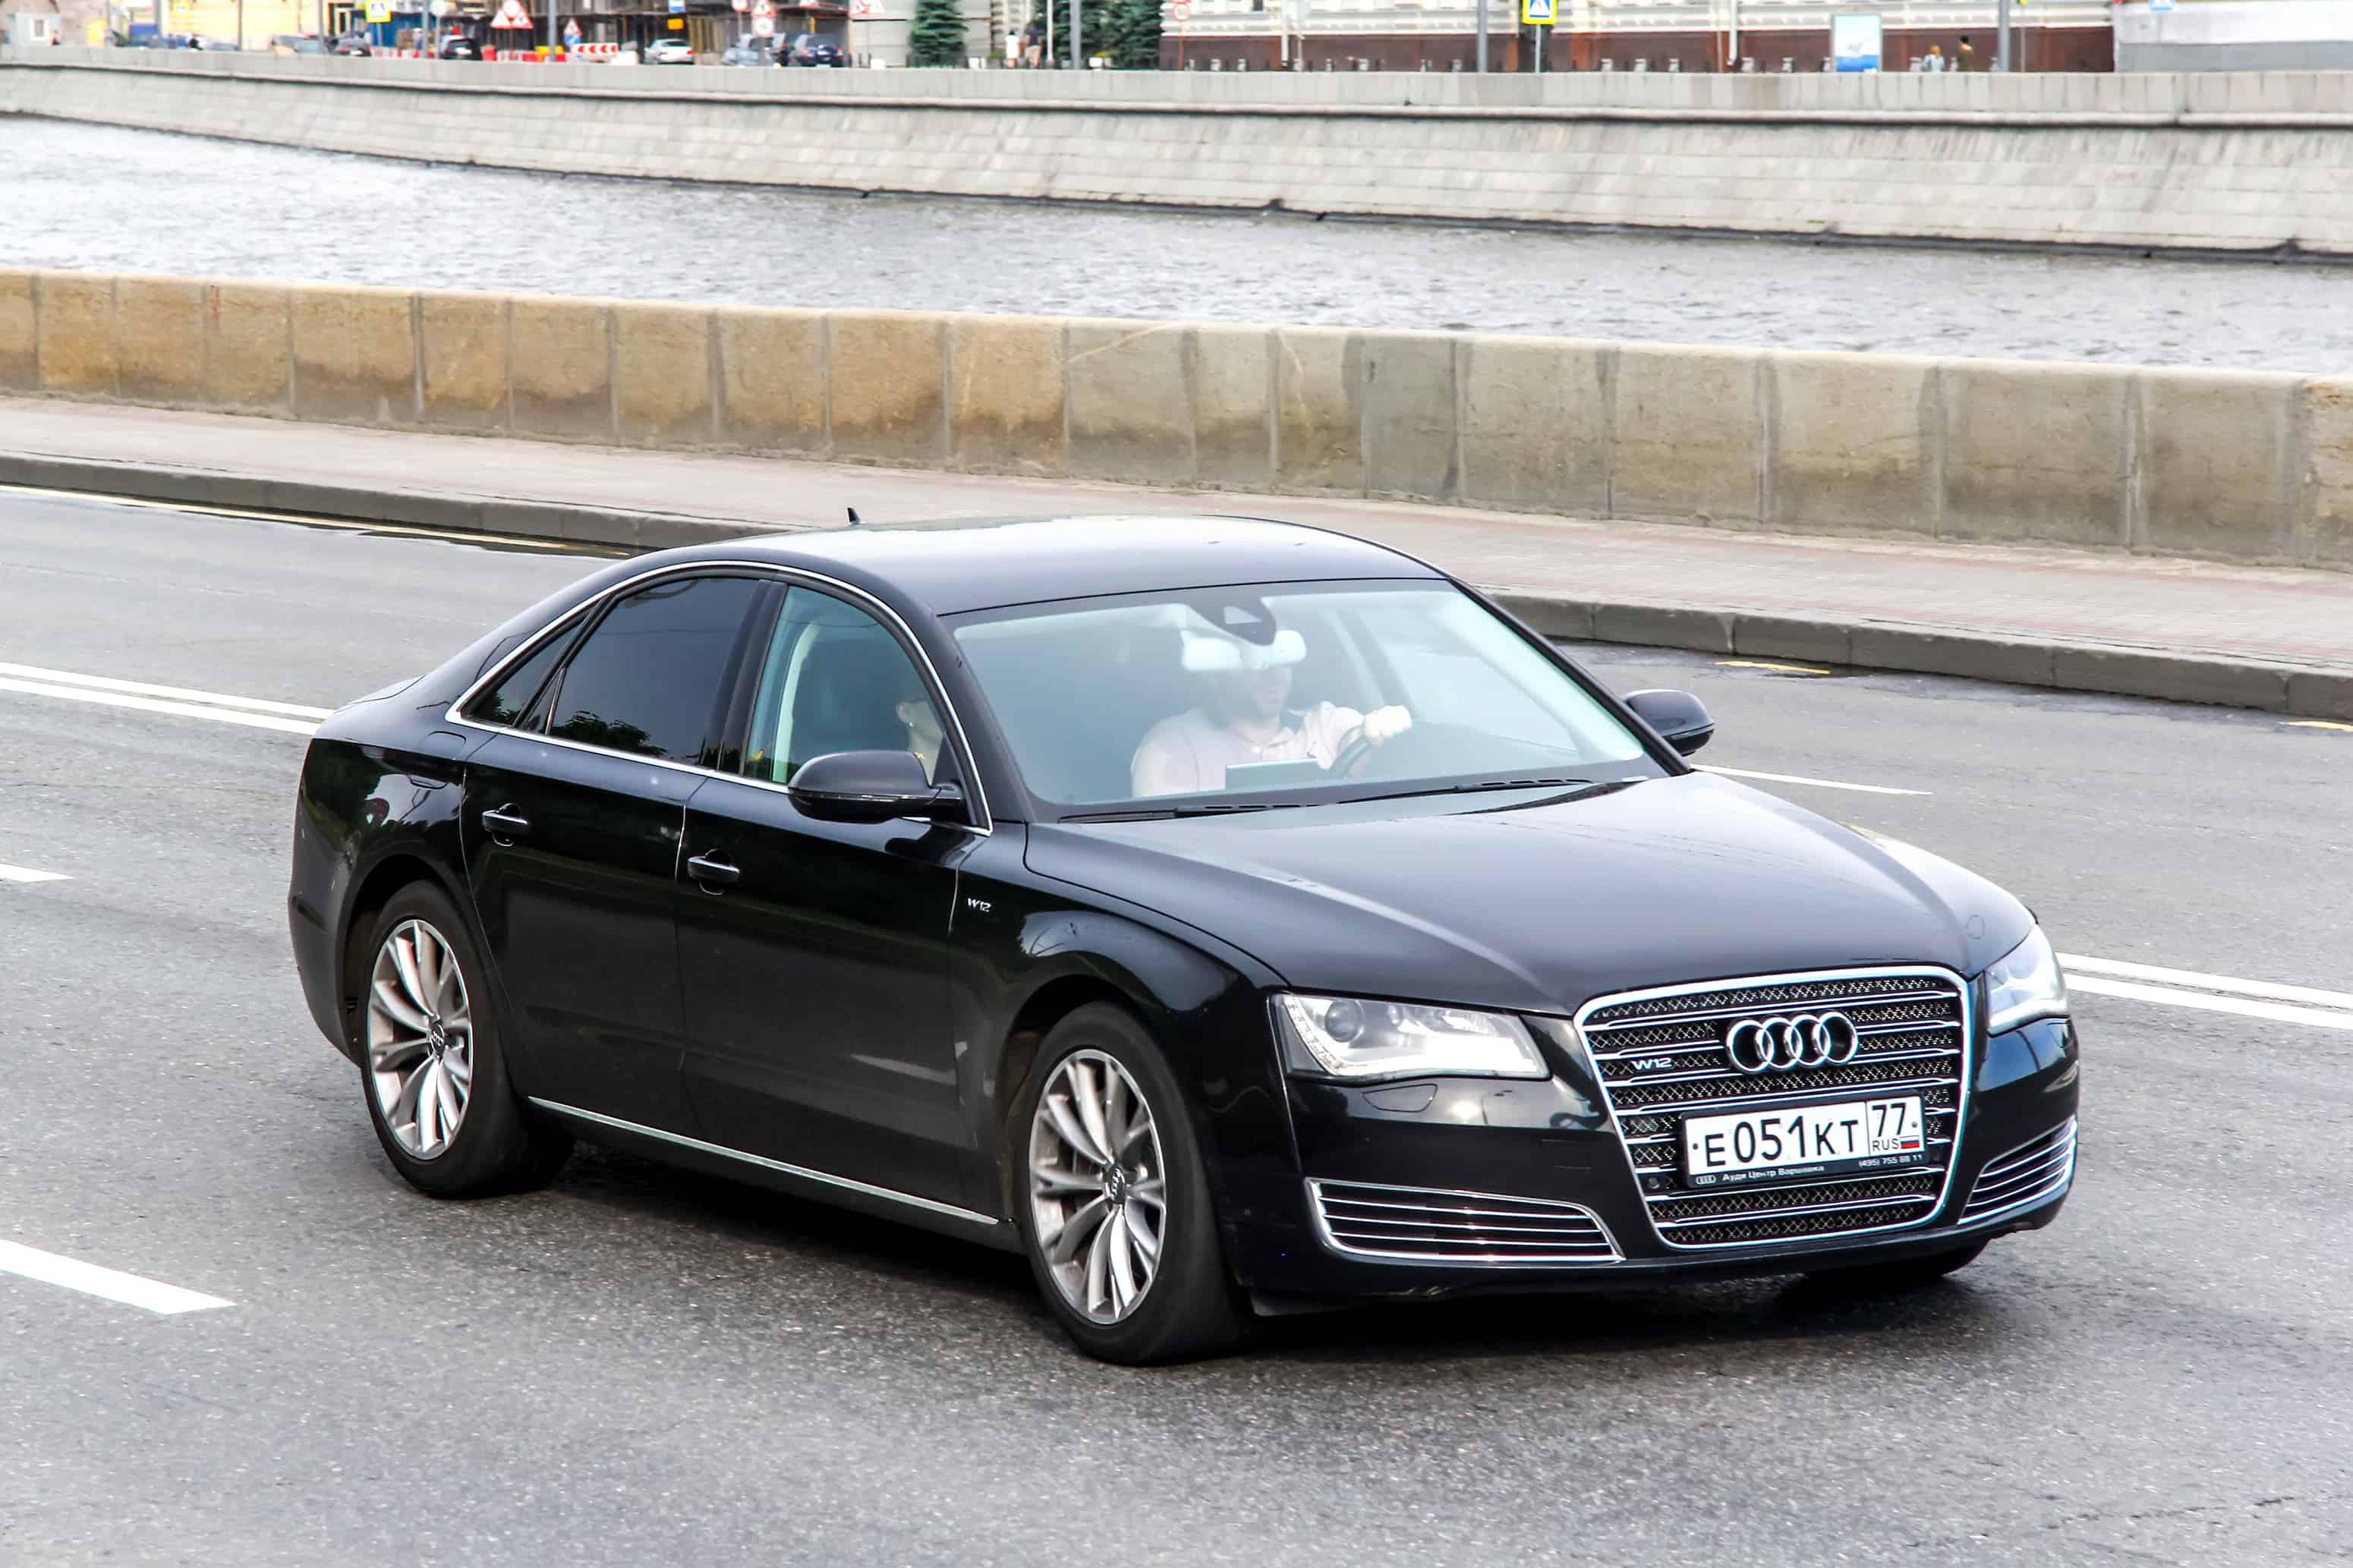 Volkswagen recalls nearly 13,000 Audi luxury sedans for engine fire risk